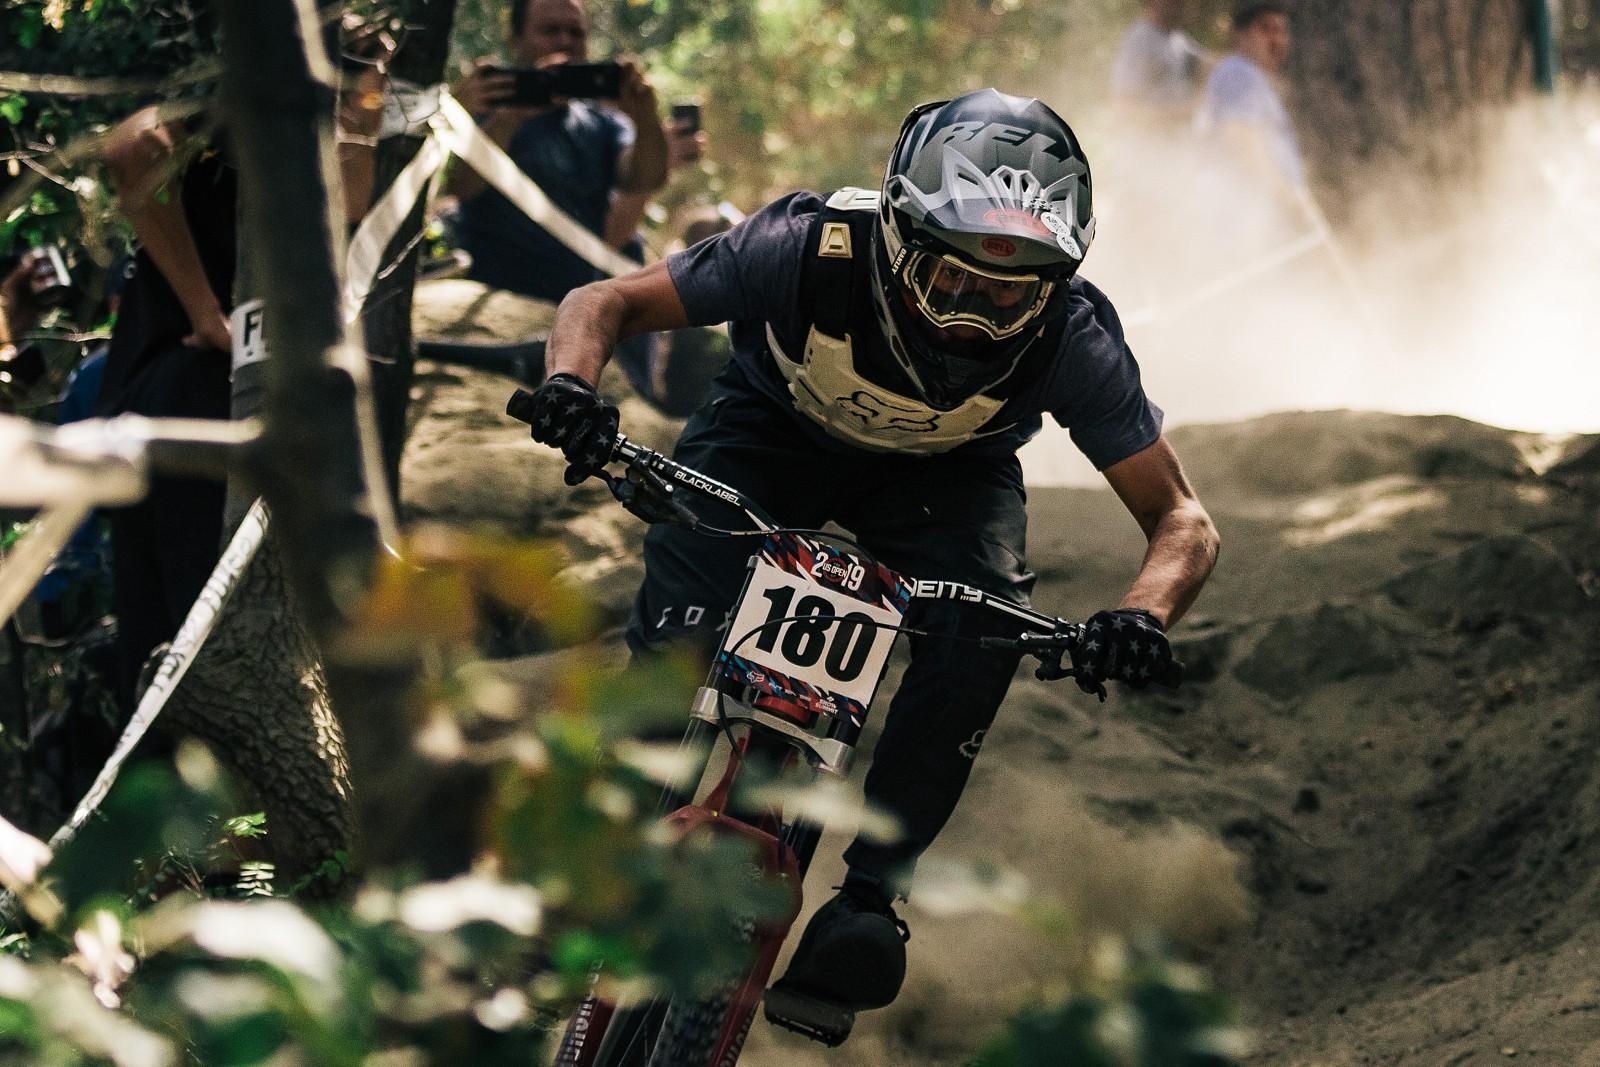 2019USOpenMTB DH yellow-19 - ALeedomPhotography - Mountain Biking Pictures - Vital MTB